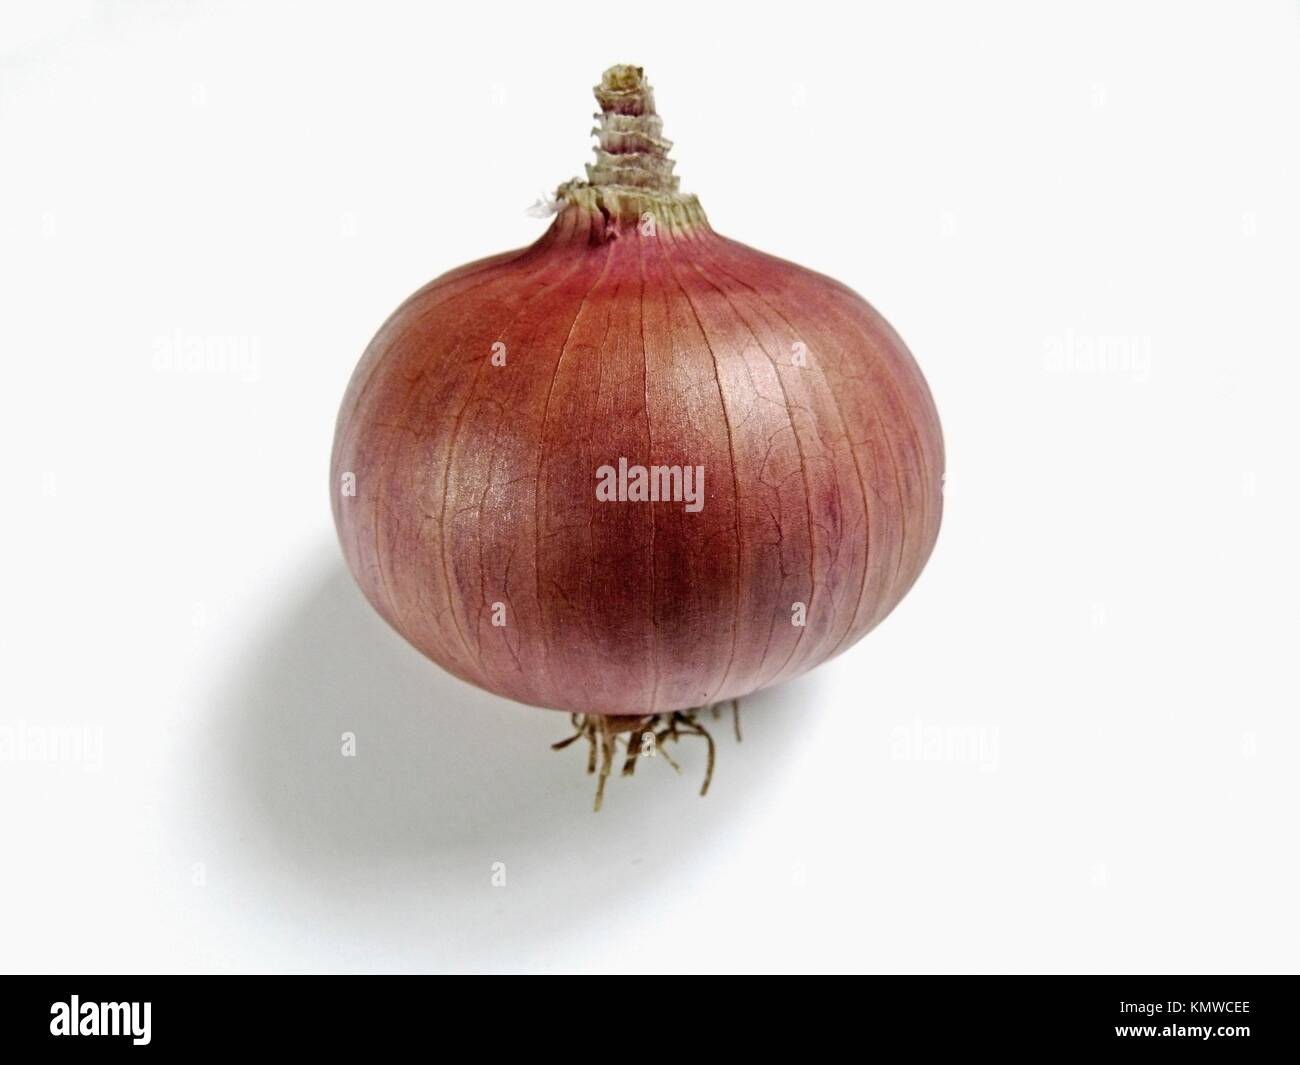 Zwiebel, Allium Cepa, verbreiteten Gemüse Stockbild